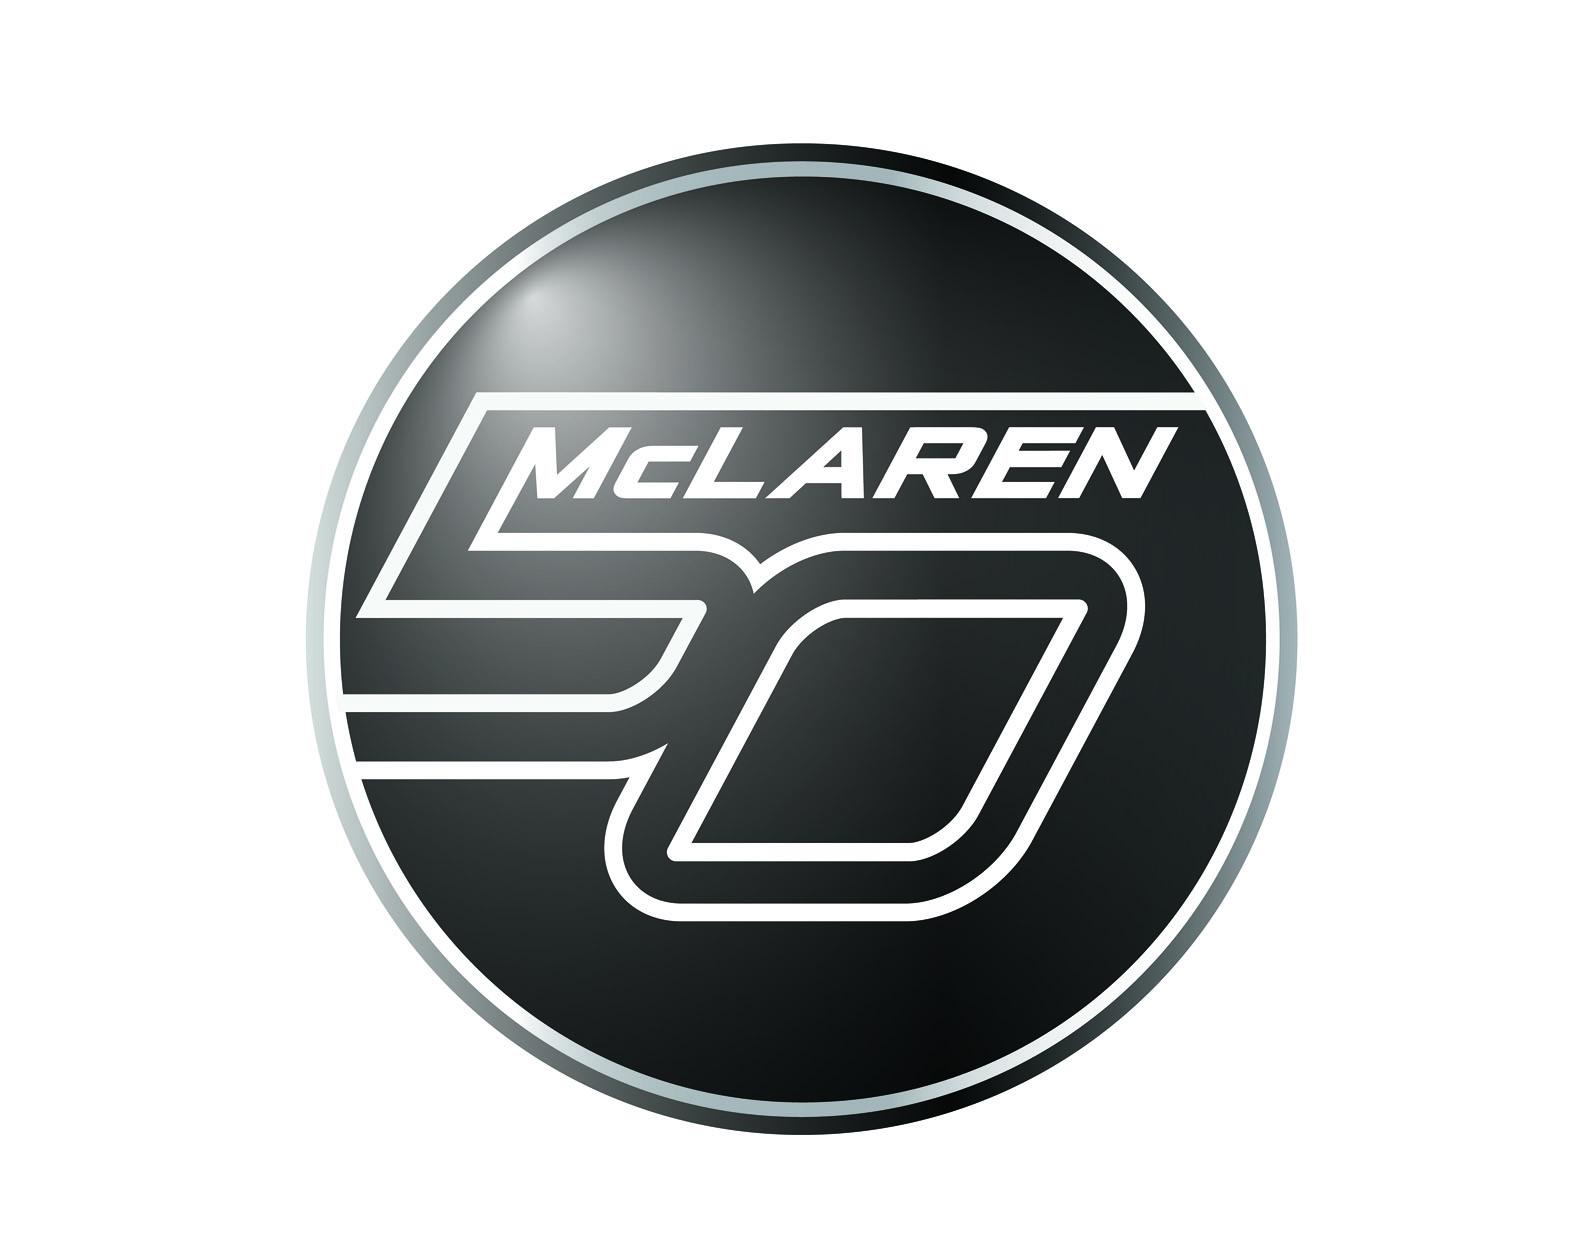 2013 Celebrating 50 Years Of Mclaren Extra